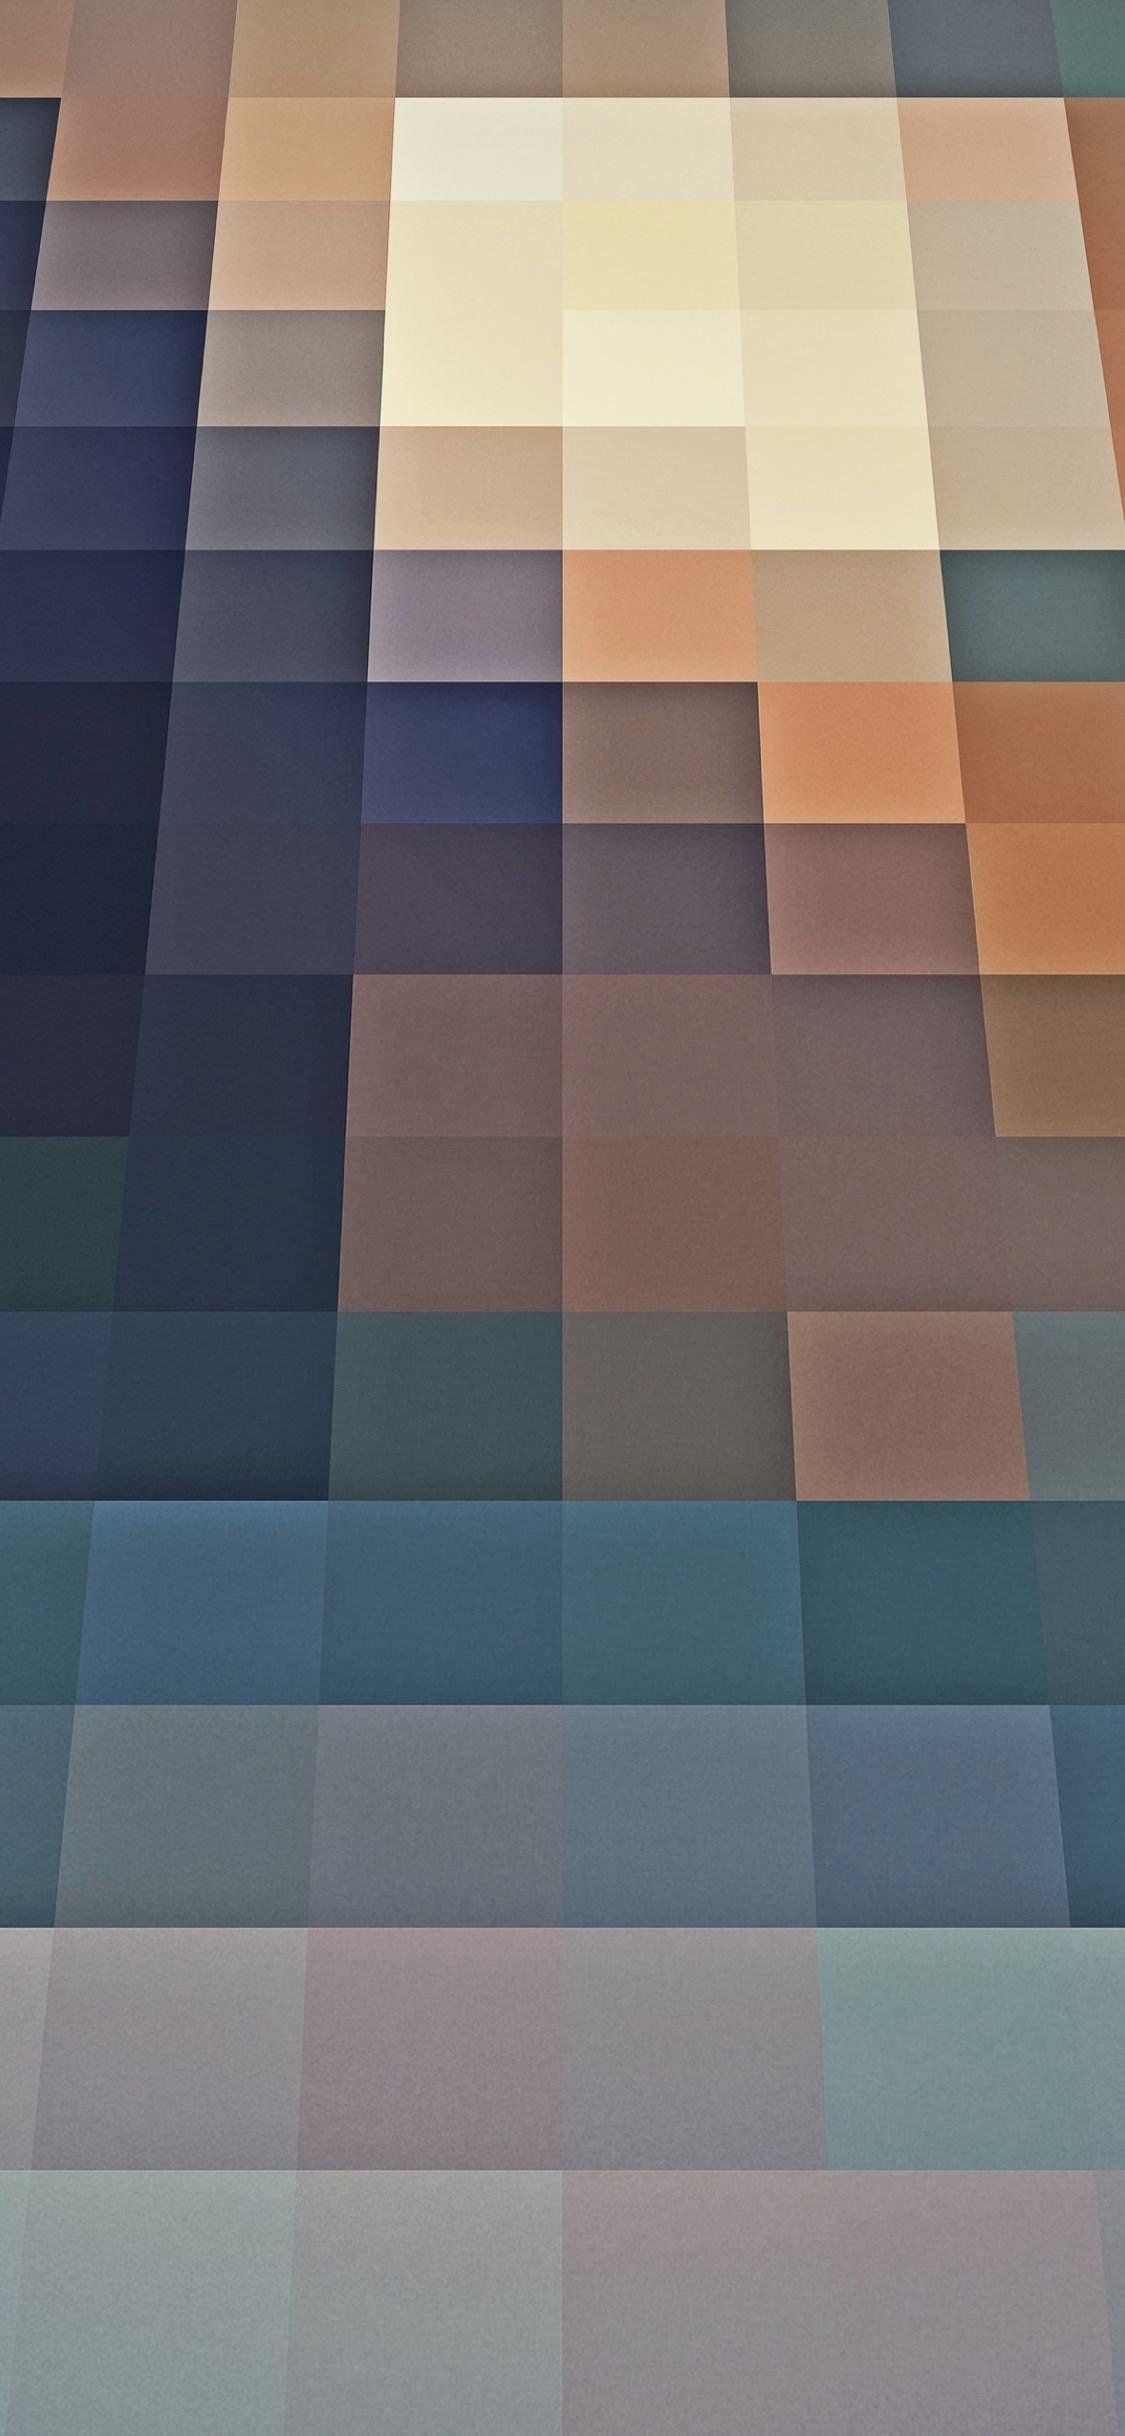 iPhone X 壁紙 wallpaper 0876